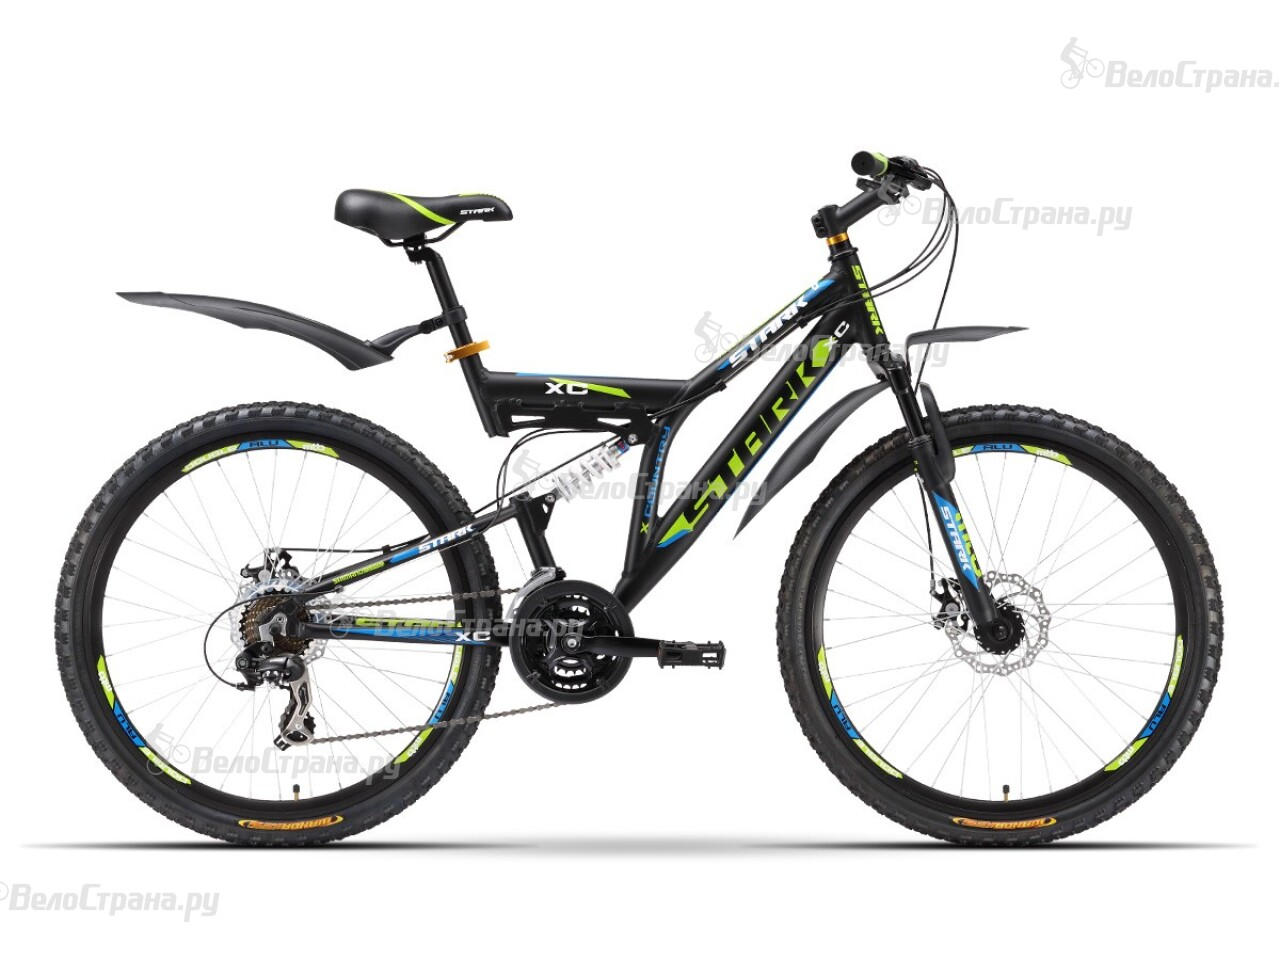 Велосипед Stark Jumper Disc (2016) stark jumper 18 2016 black green